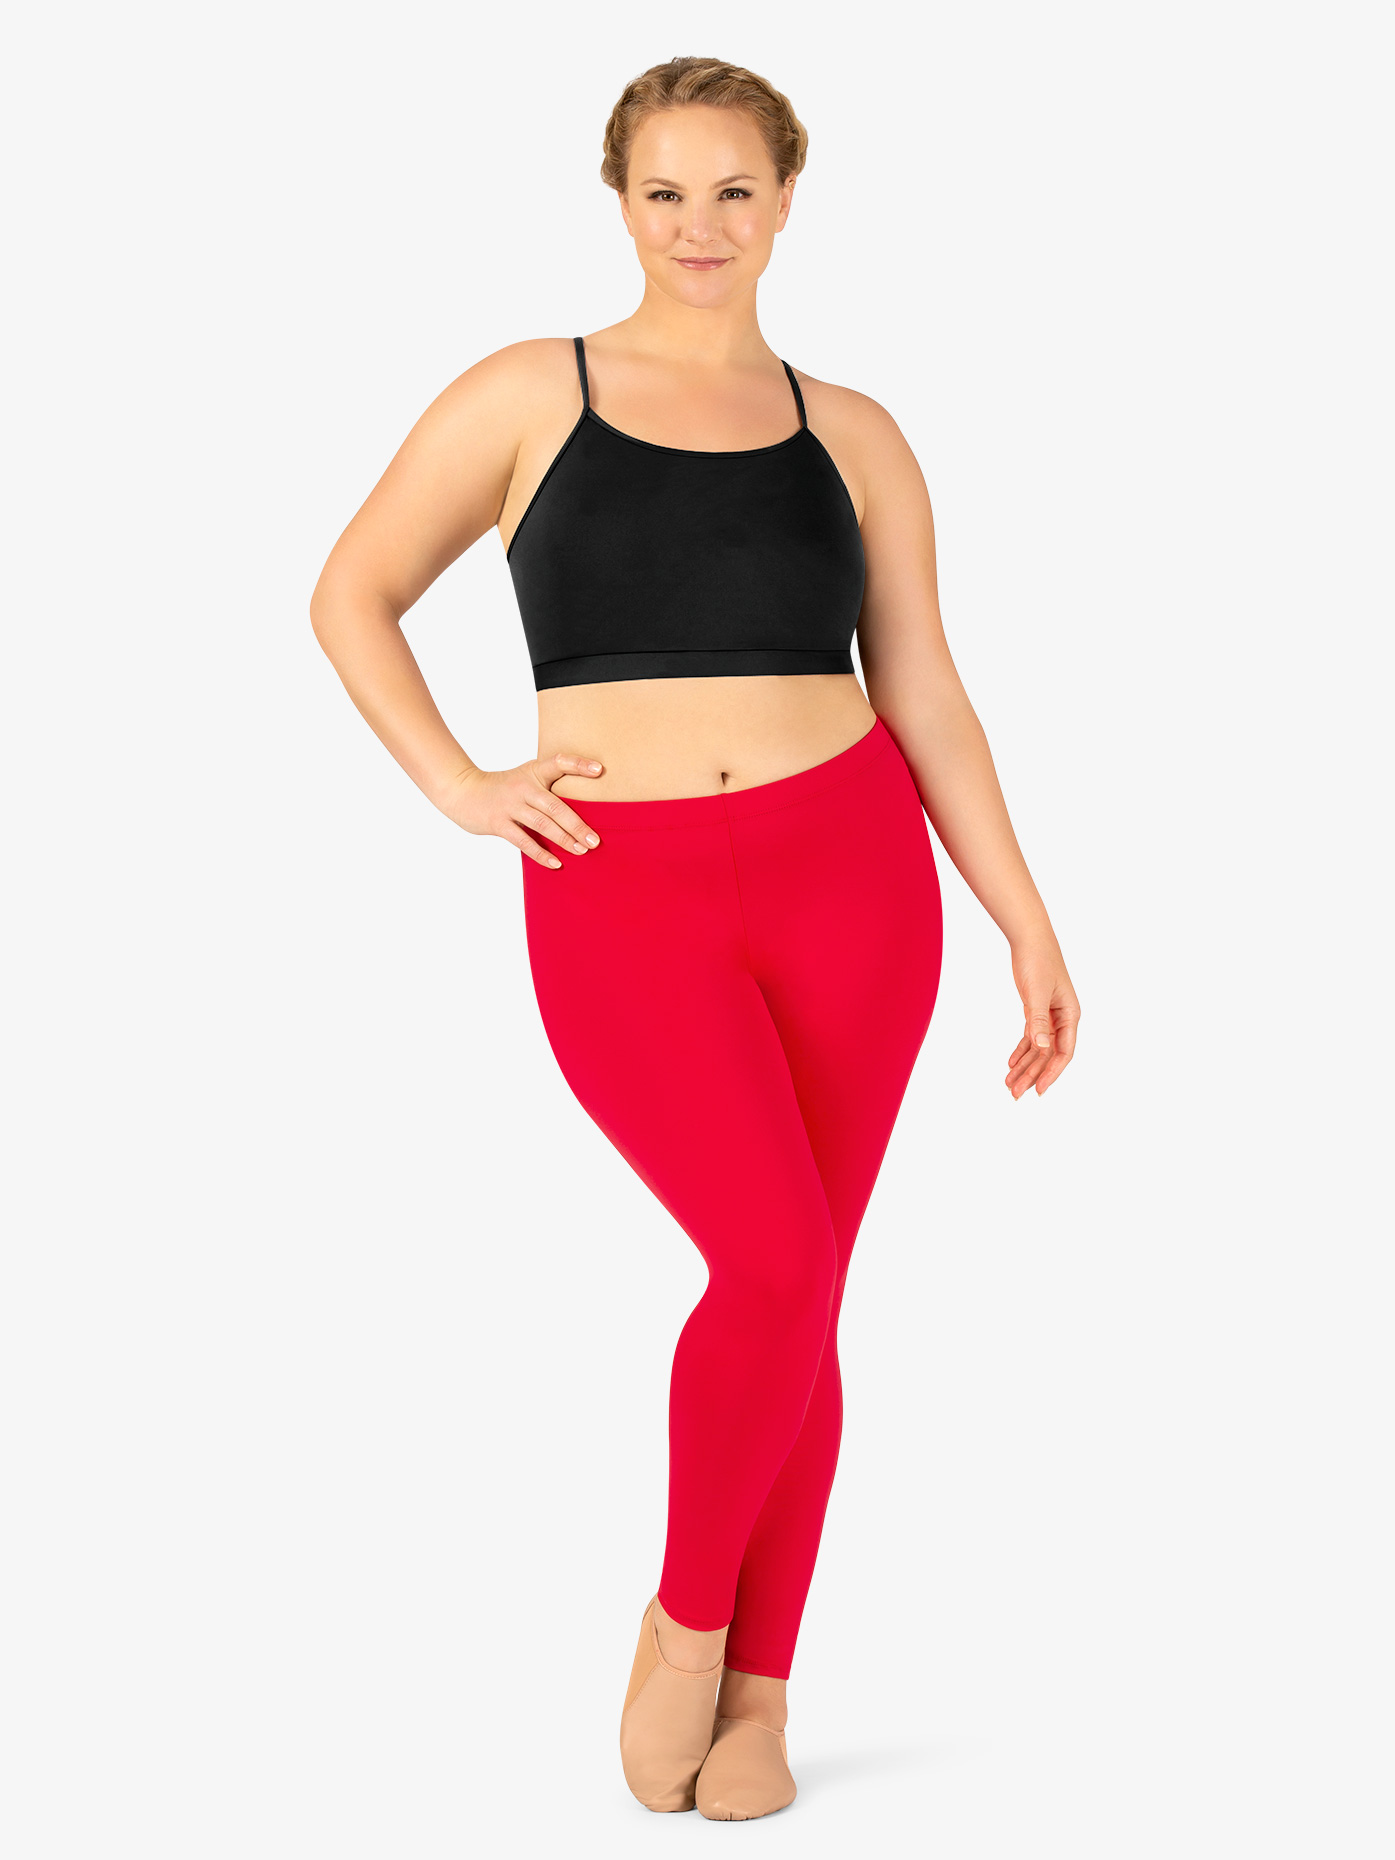 6017186ec74 Womens Plus Size Team Basic Compression Dance Legging - Style No BT5207P. Loading  zoom